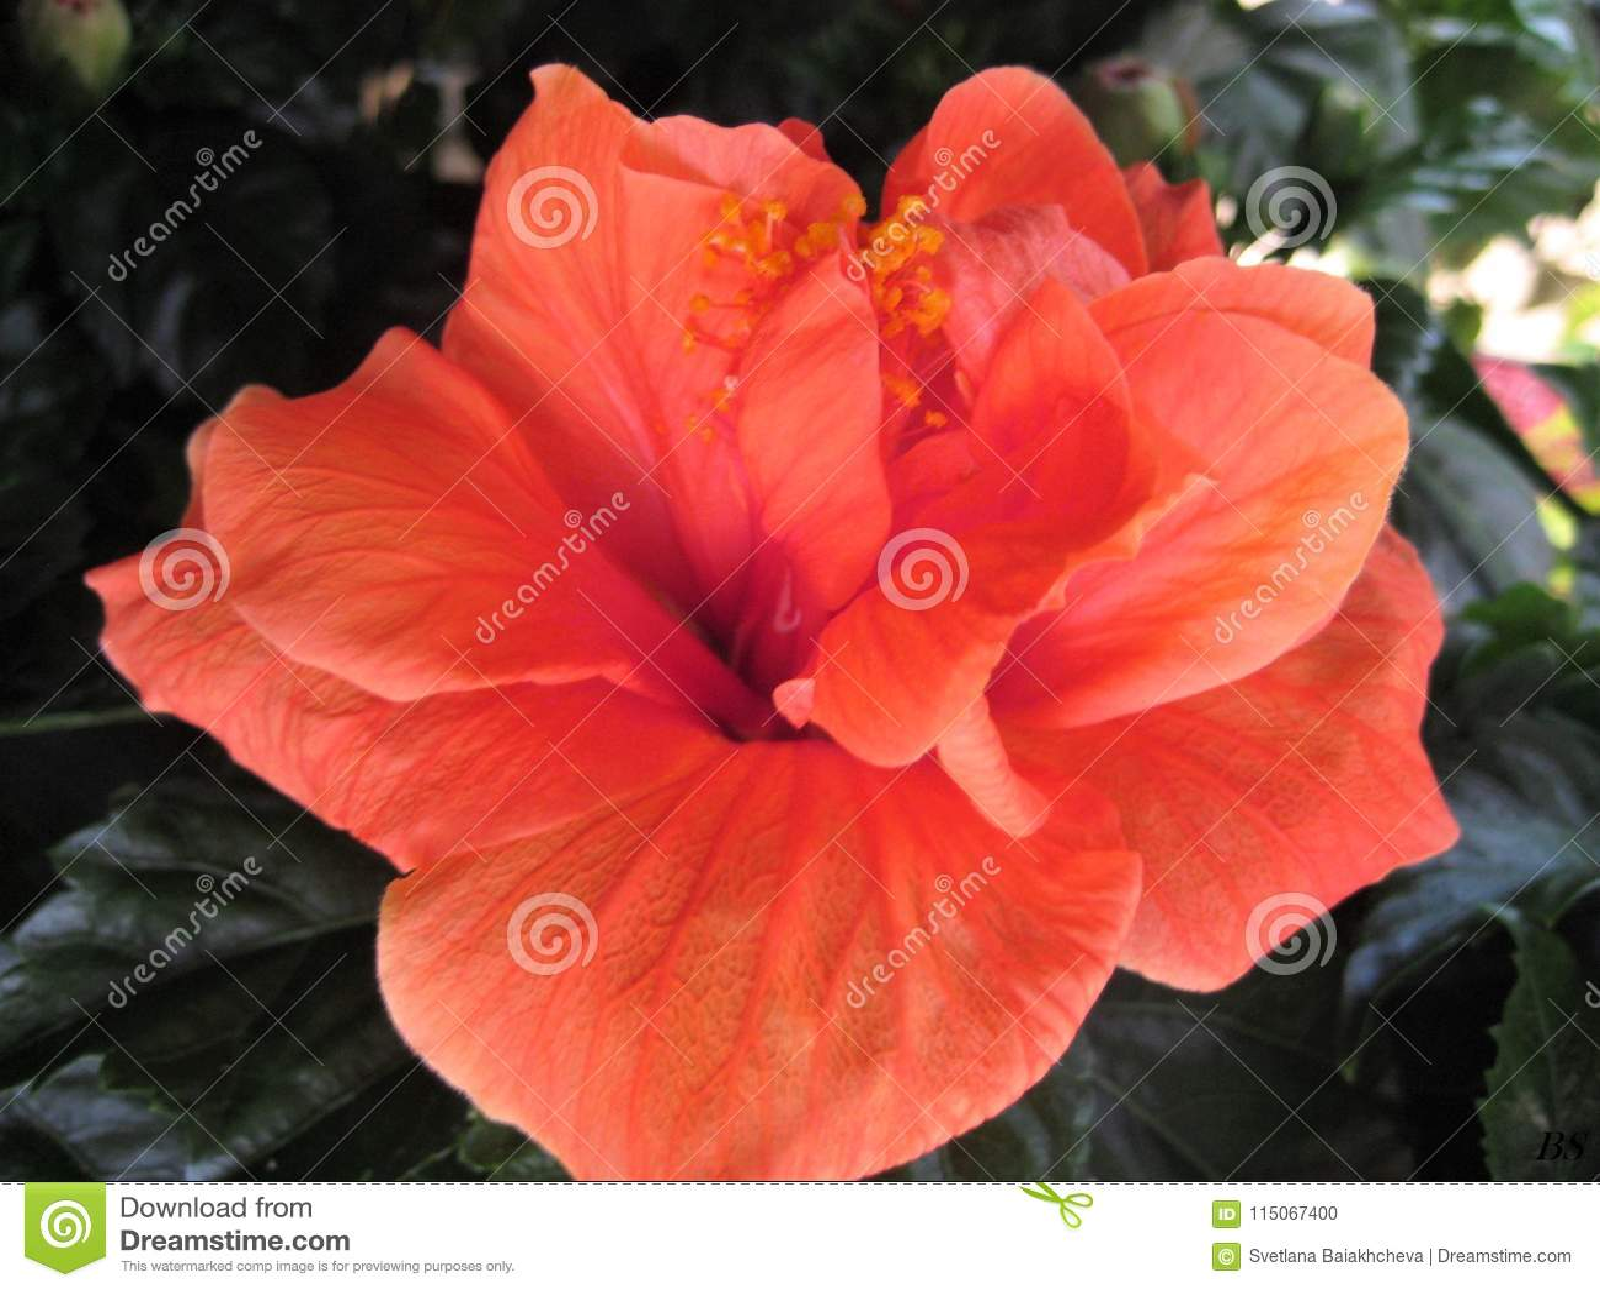 Macro photo with decorative background texture beautiful delicate macro photo with decorative background texture beautiful delicate pink hue color petals hibiscus flower izmirmasajfo